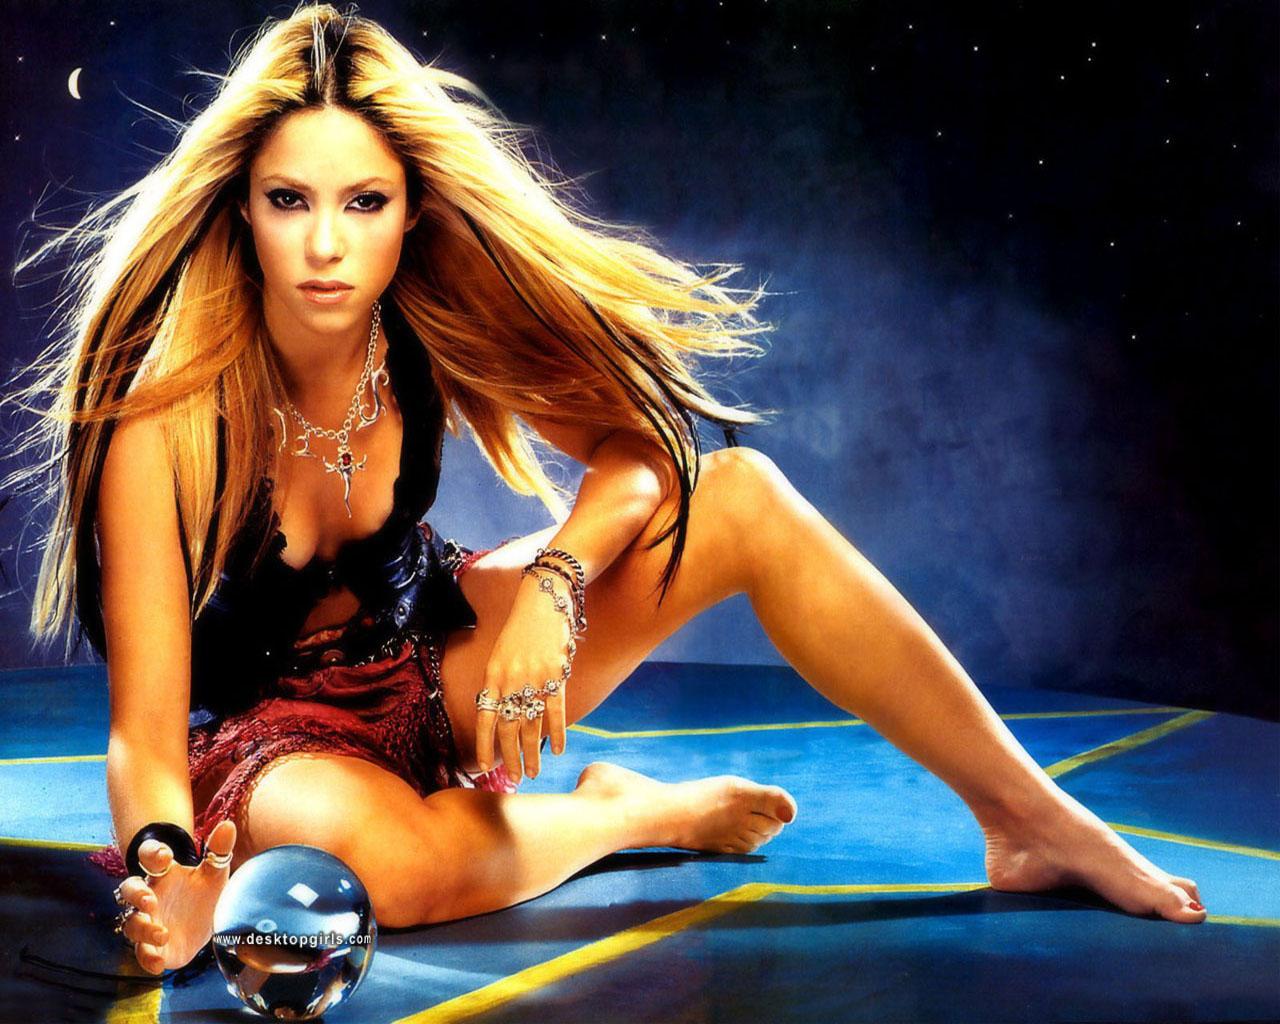 http://4.bp.blogspot.com/-_3Io7VoxITE/TyF2GEXZ5LI/AAAAAAAABK4/khevL7_-T28/s1600/Shakira_fondo_pantalla.jpg